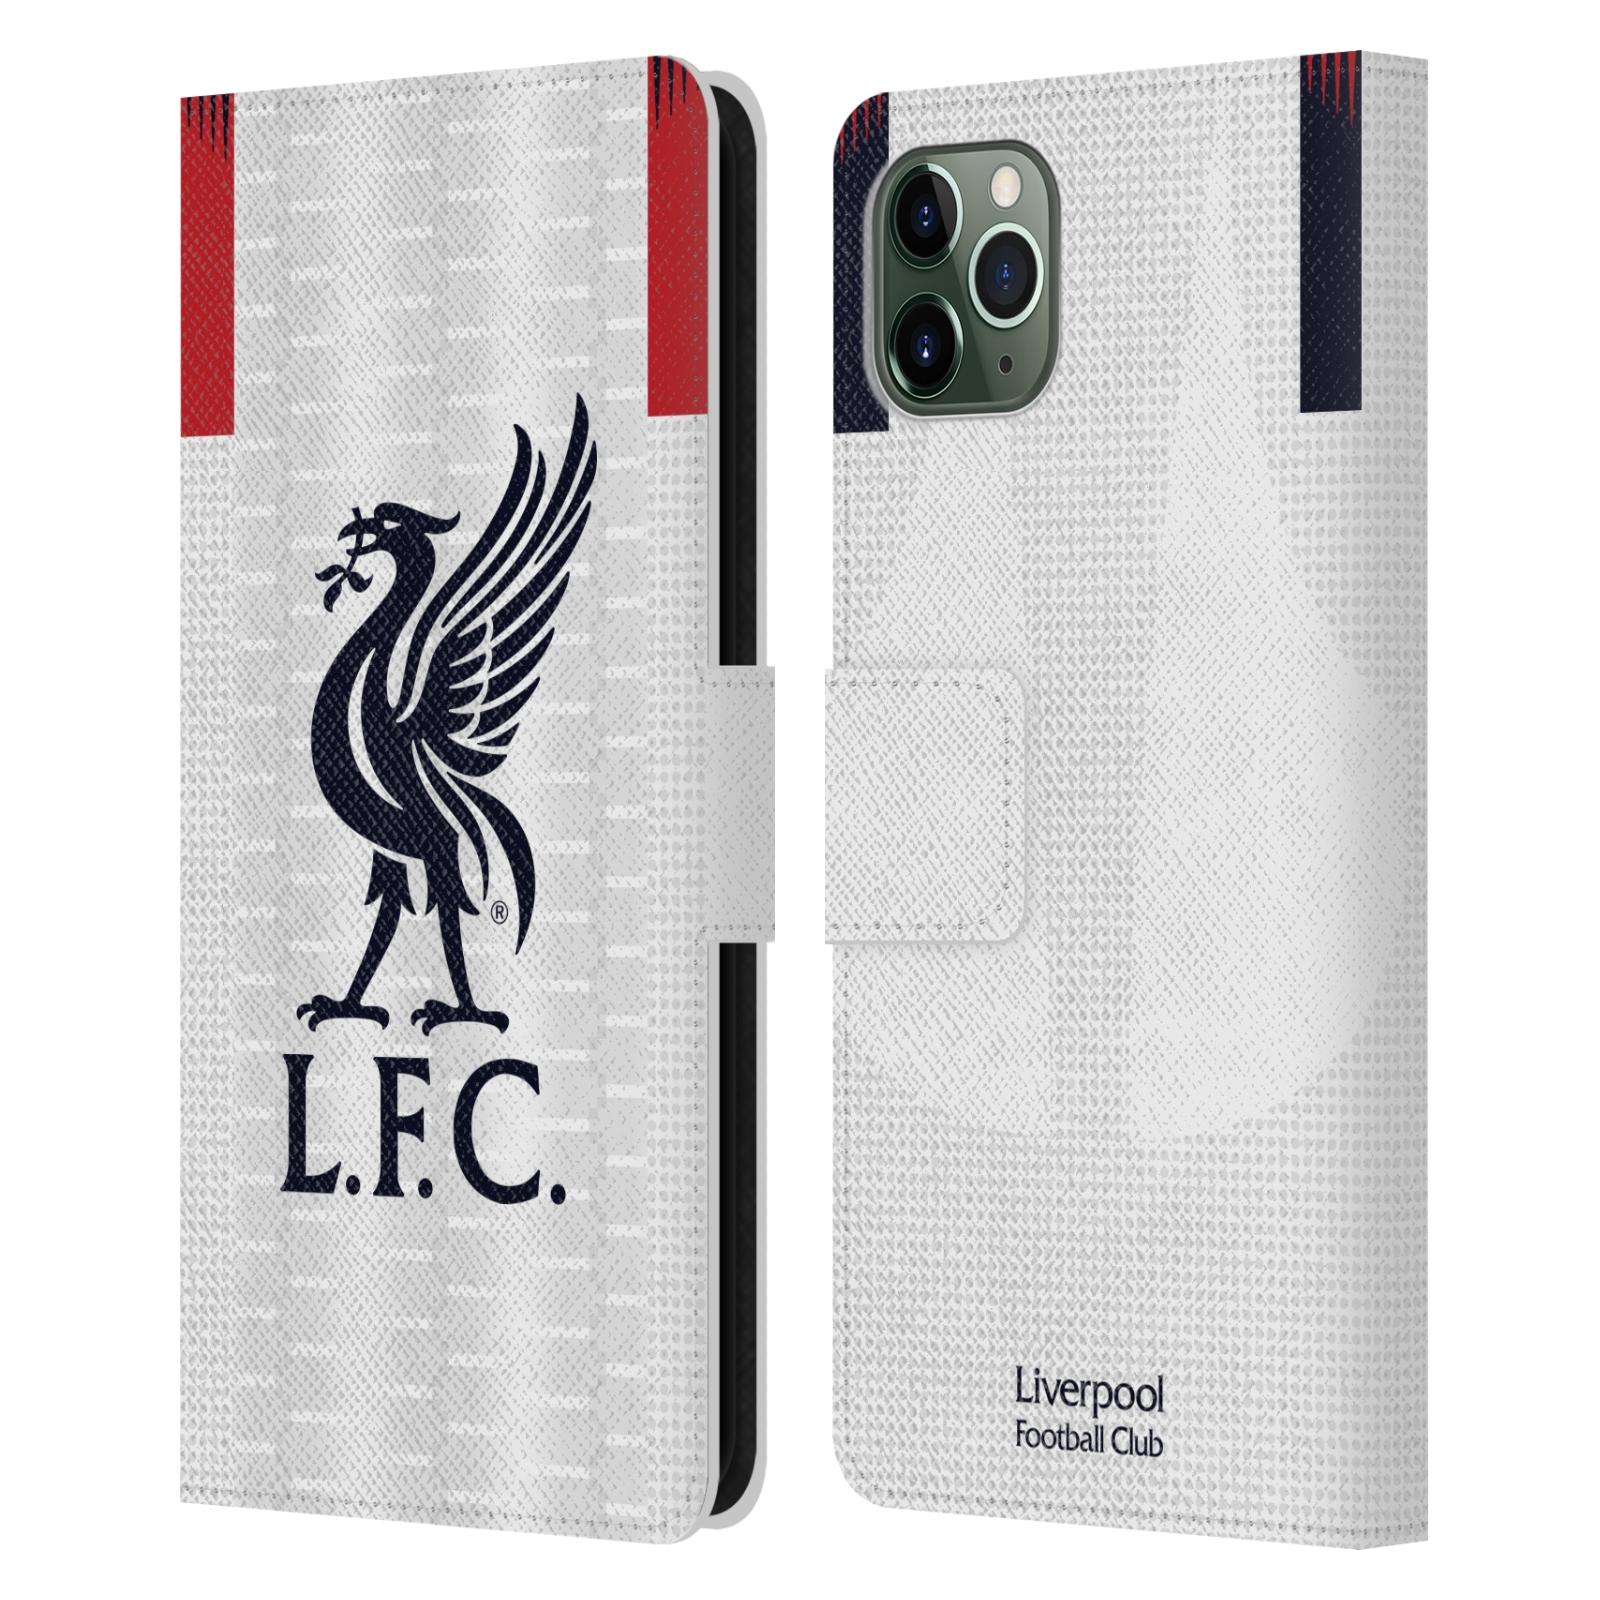 Pouzdro na mobil Apple Iphone 11 PRO MAX - Head Case - fotbalový klub liverpool bílý dres